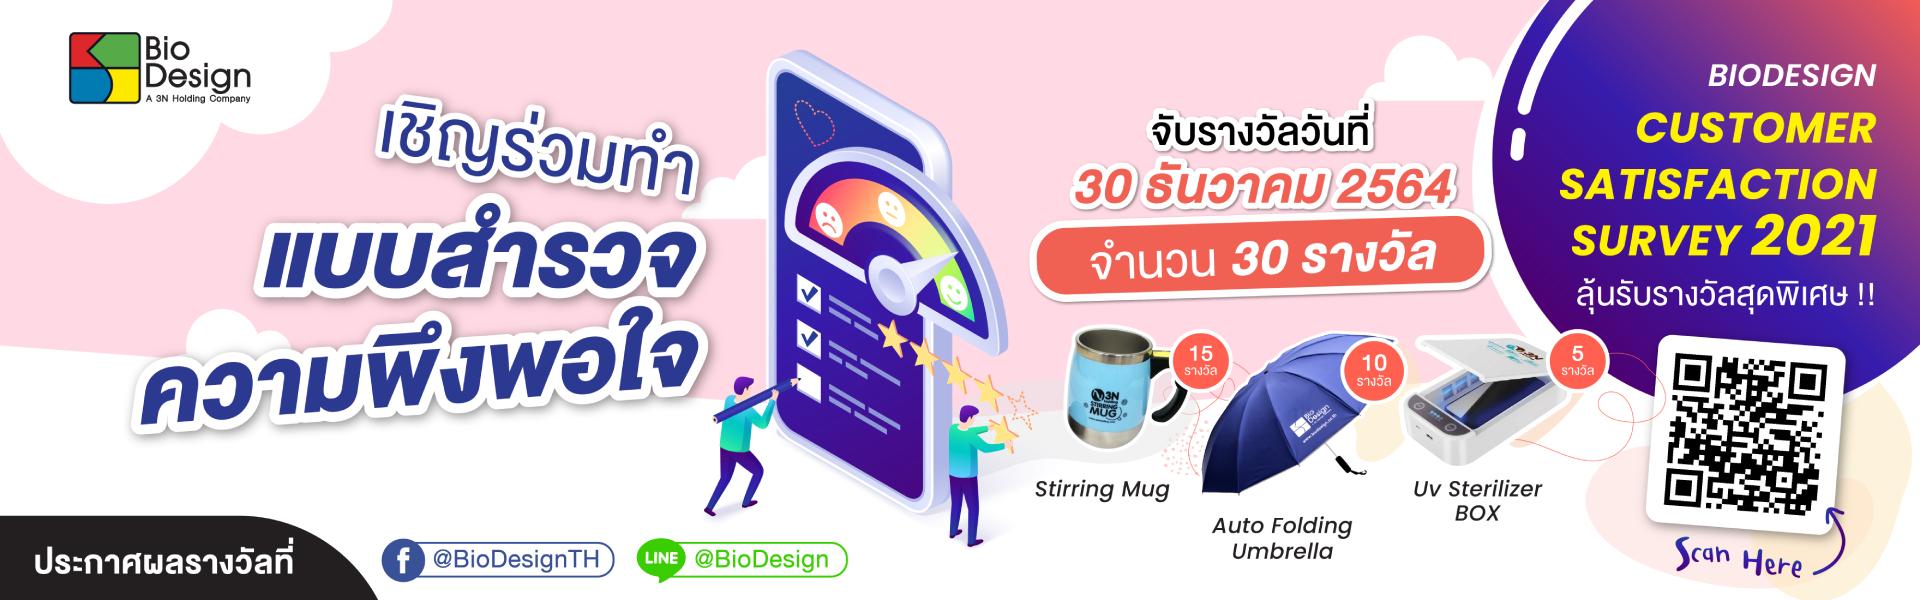 BioDesign Customer Satisfaction Survey 2021